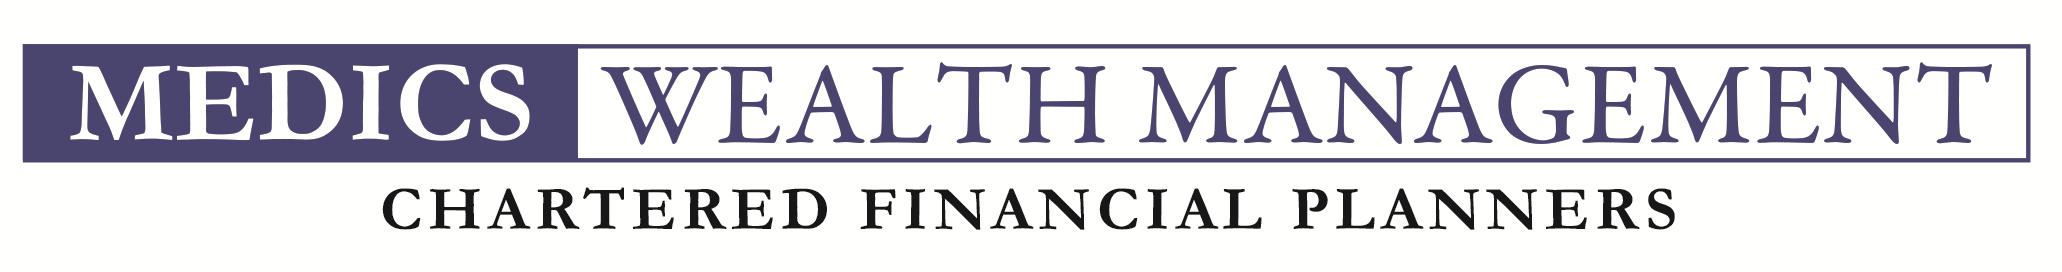 93217656 Medics Wealth Management Logo